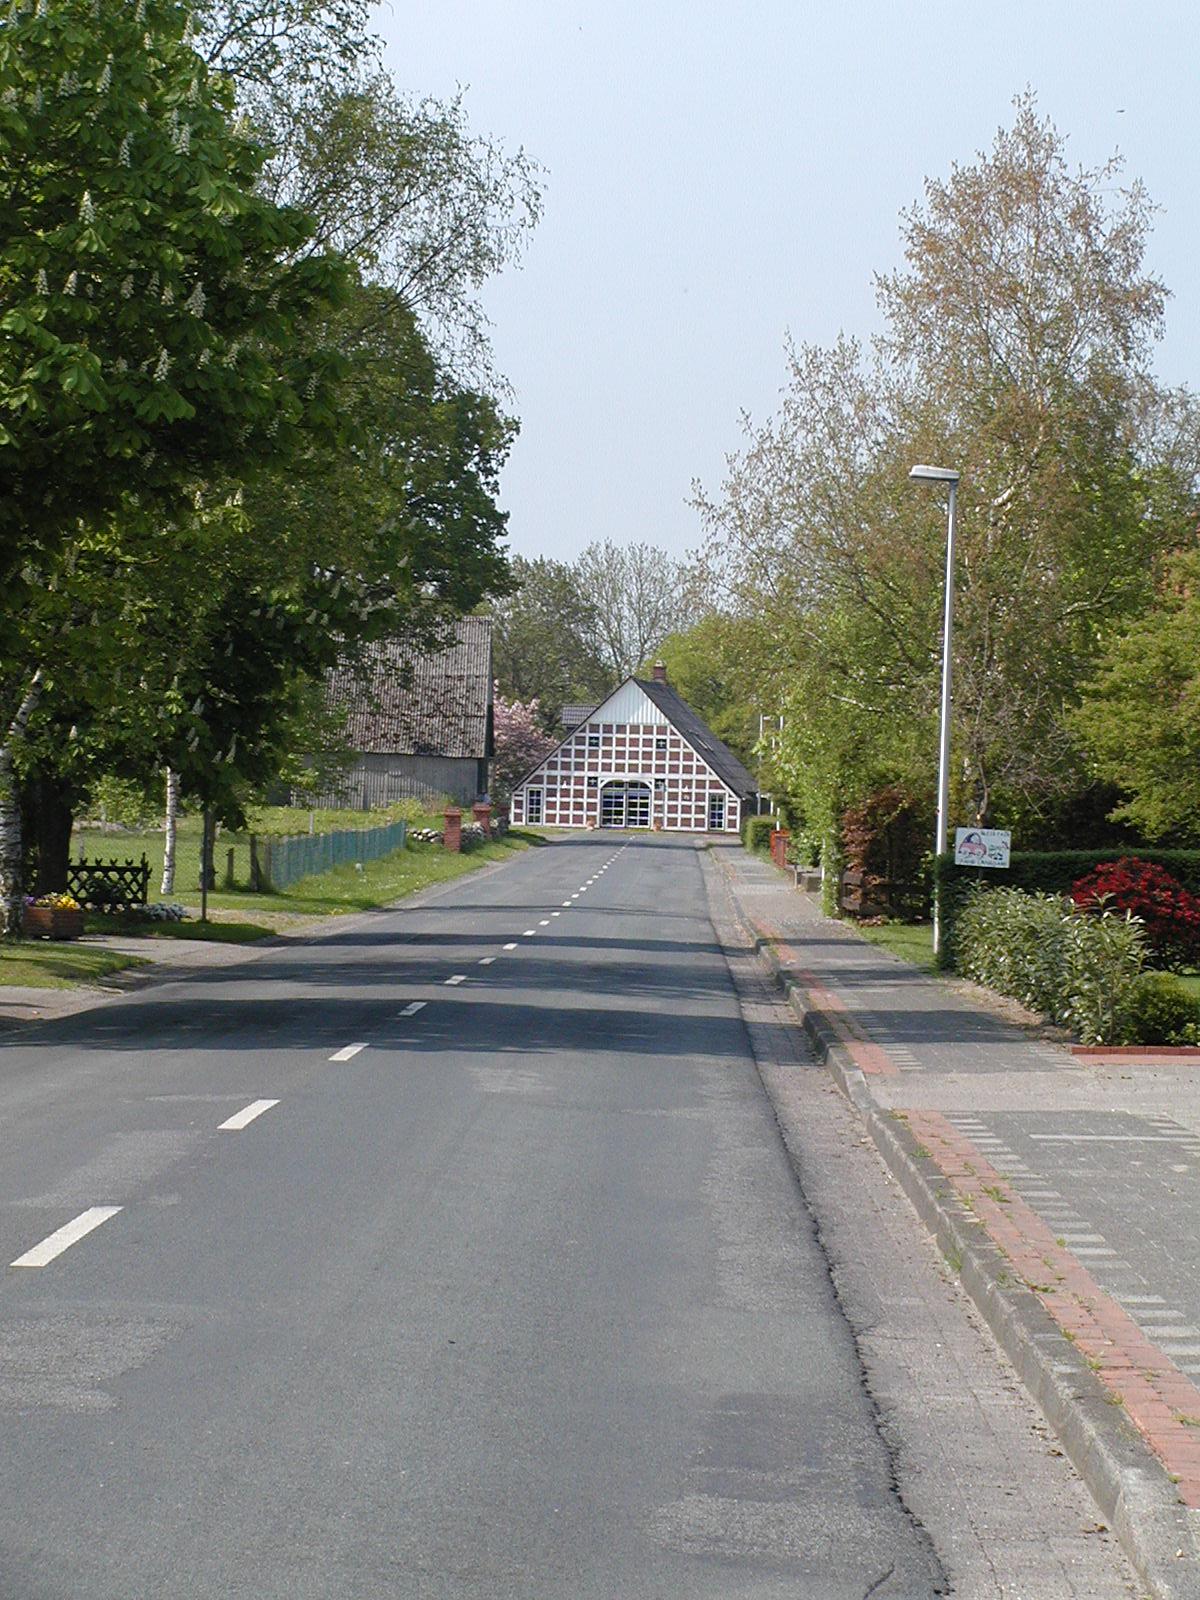 Stinstedt